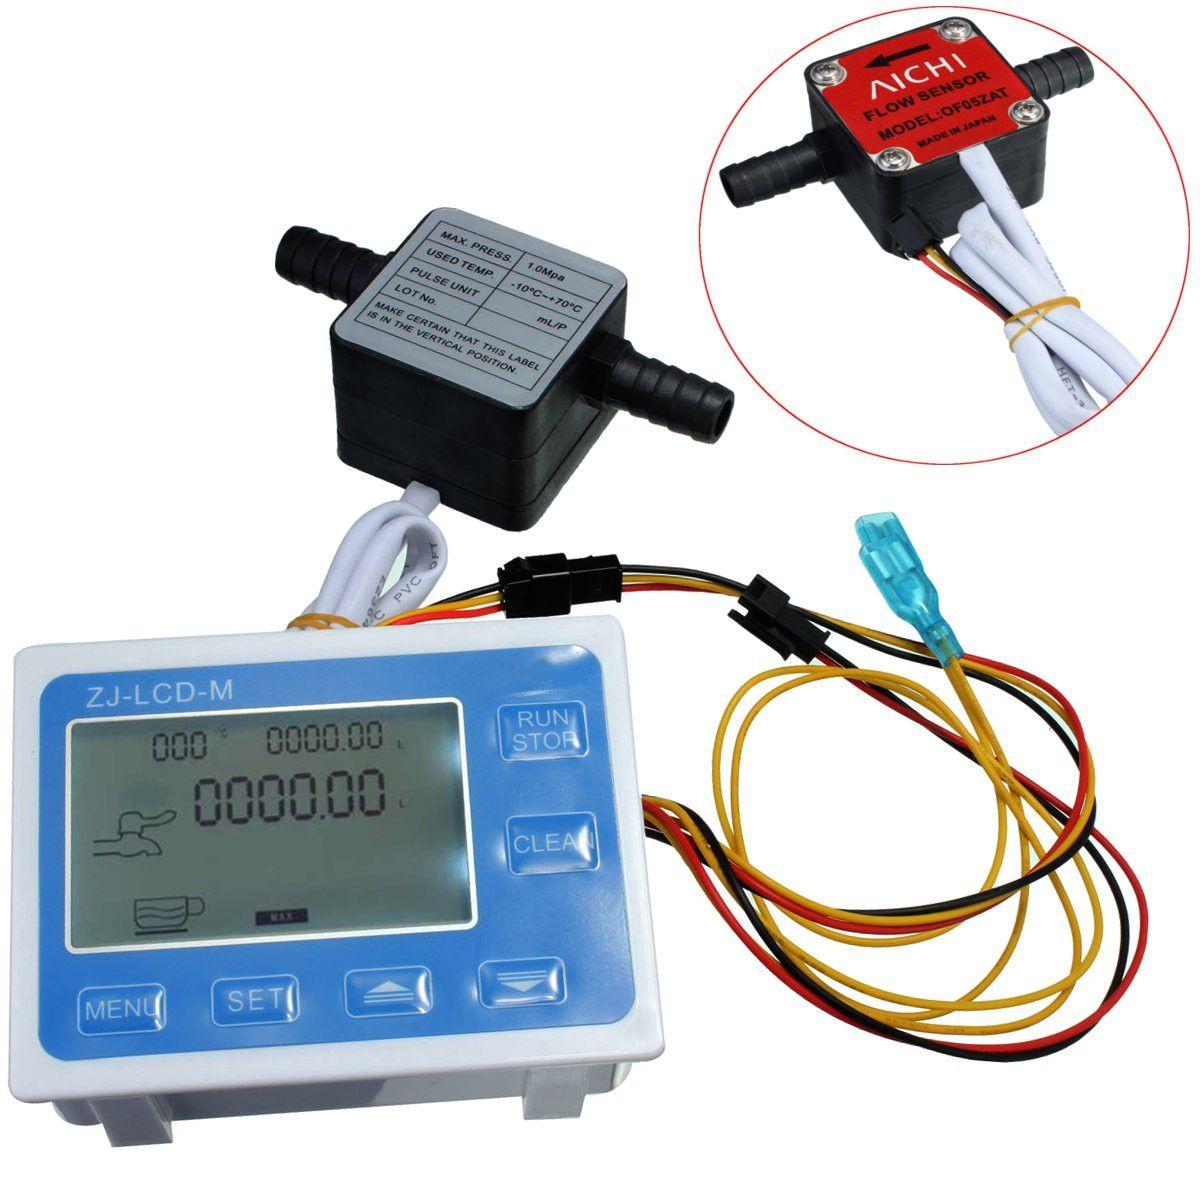 high precision liquid gear sensor lcd digital fow meter quantitativehigh precision liquid gear sensor lcd digital fow meter quantitative control